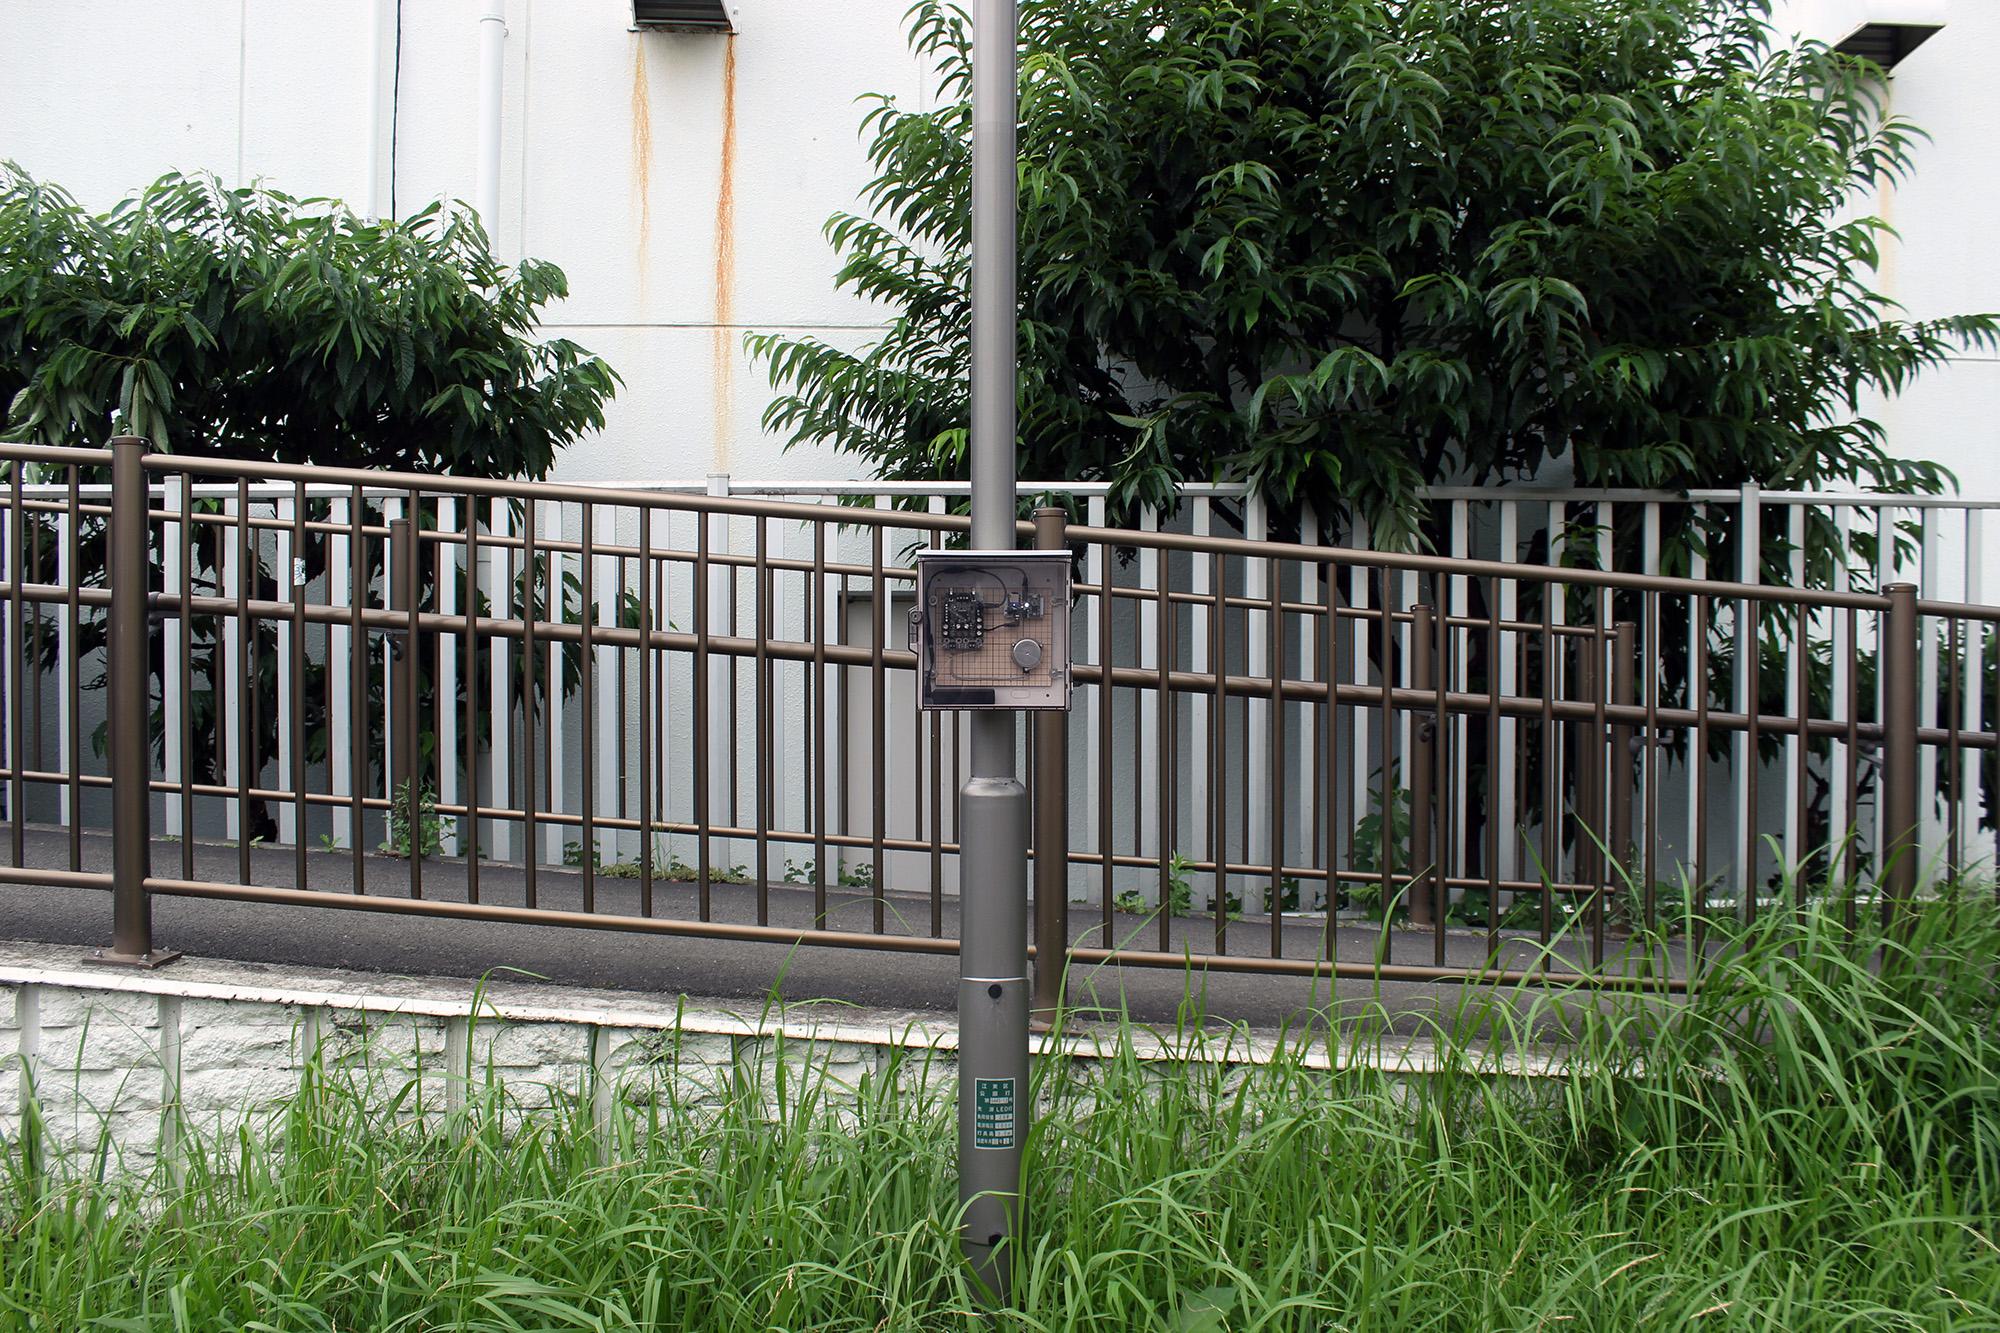 03 Onagi River - Shirakawa - Sounding the City 005 - Sumida-ku 墨田区 2019